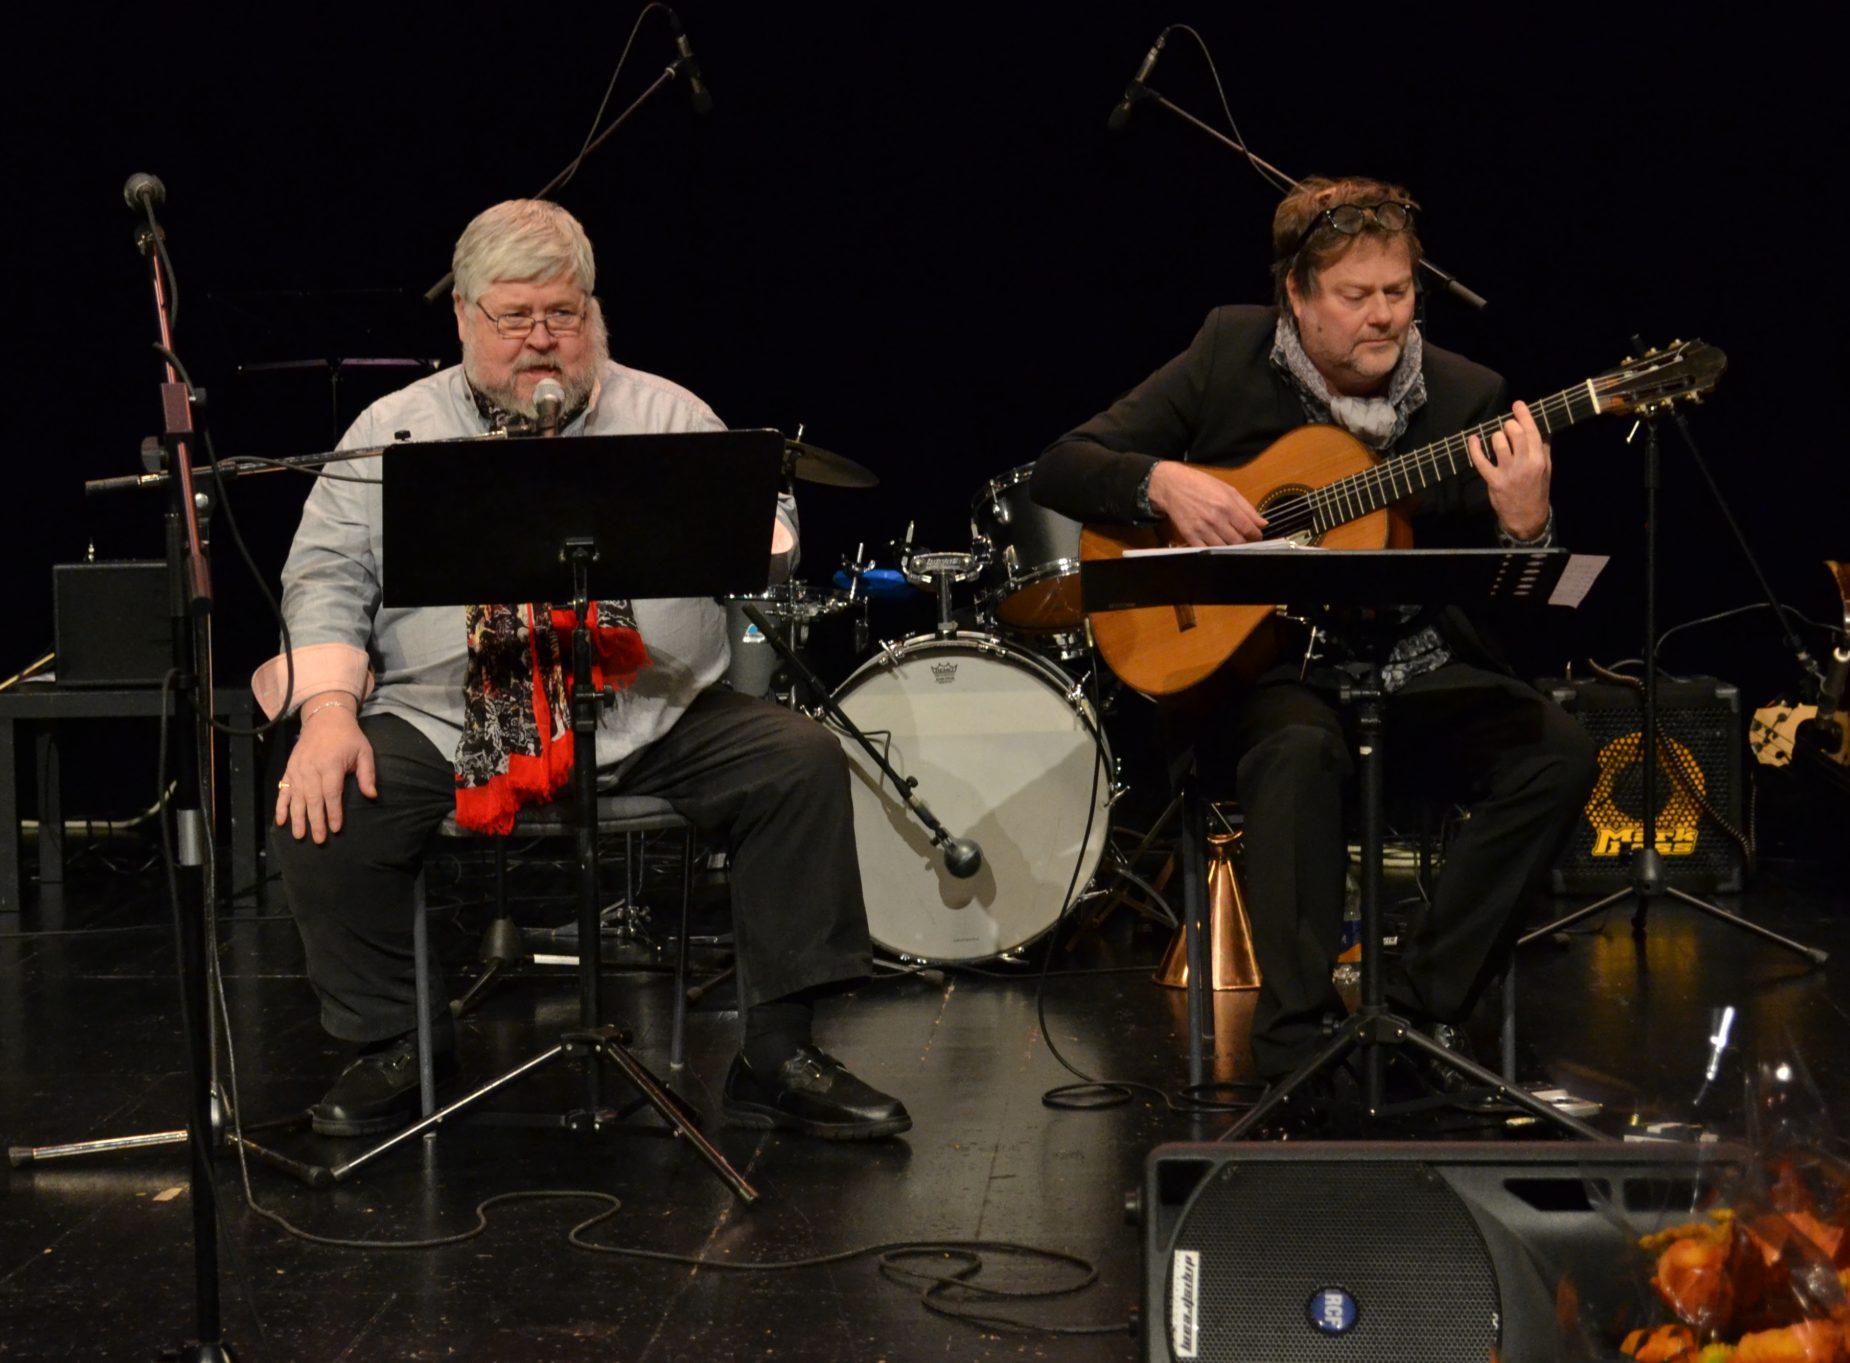 Peter Harryson o Bengt Magnusson